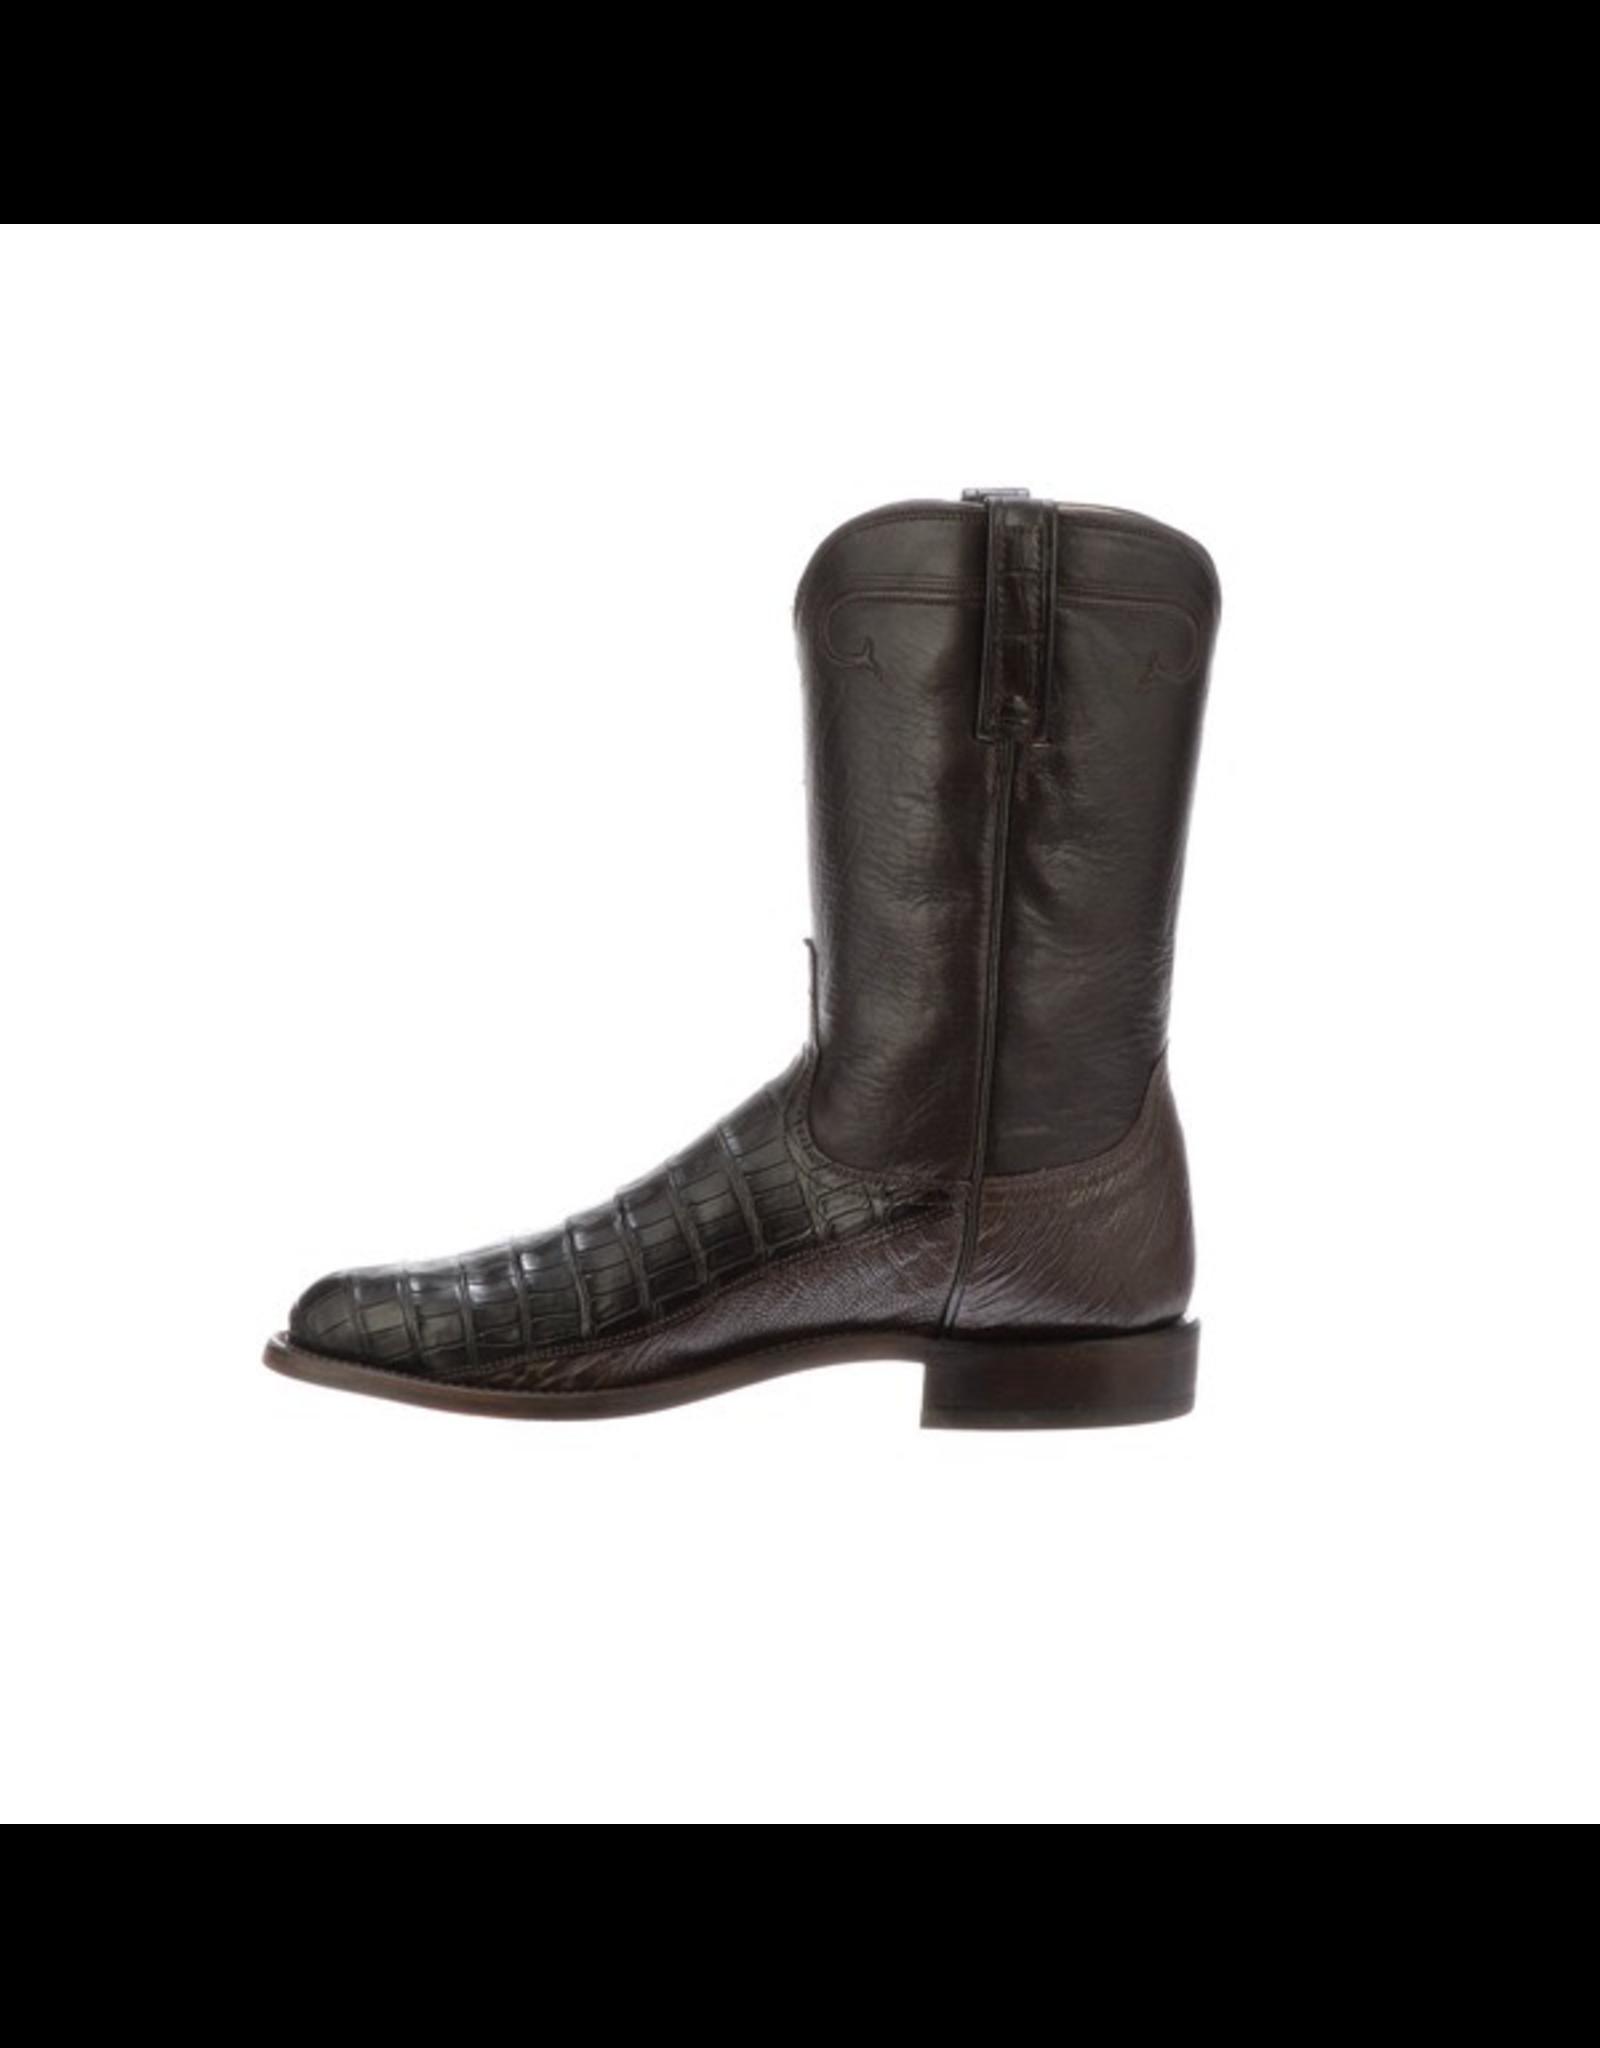 Boots-Men LUCCHESE Gerard Caiman N3050.C2